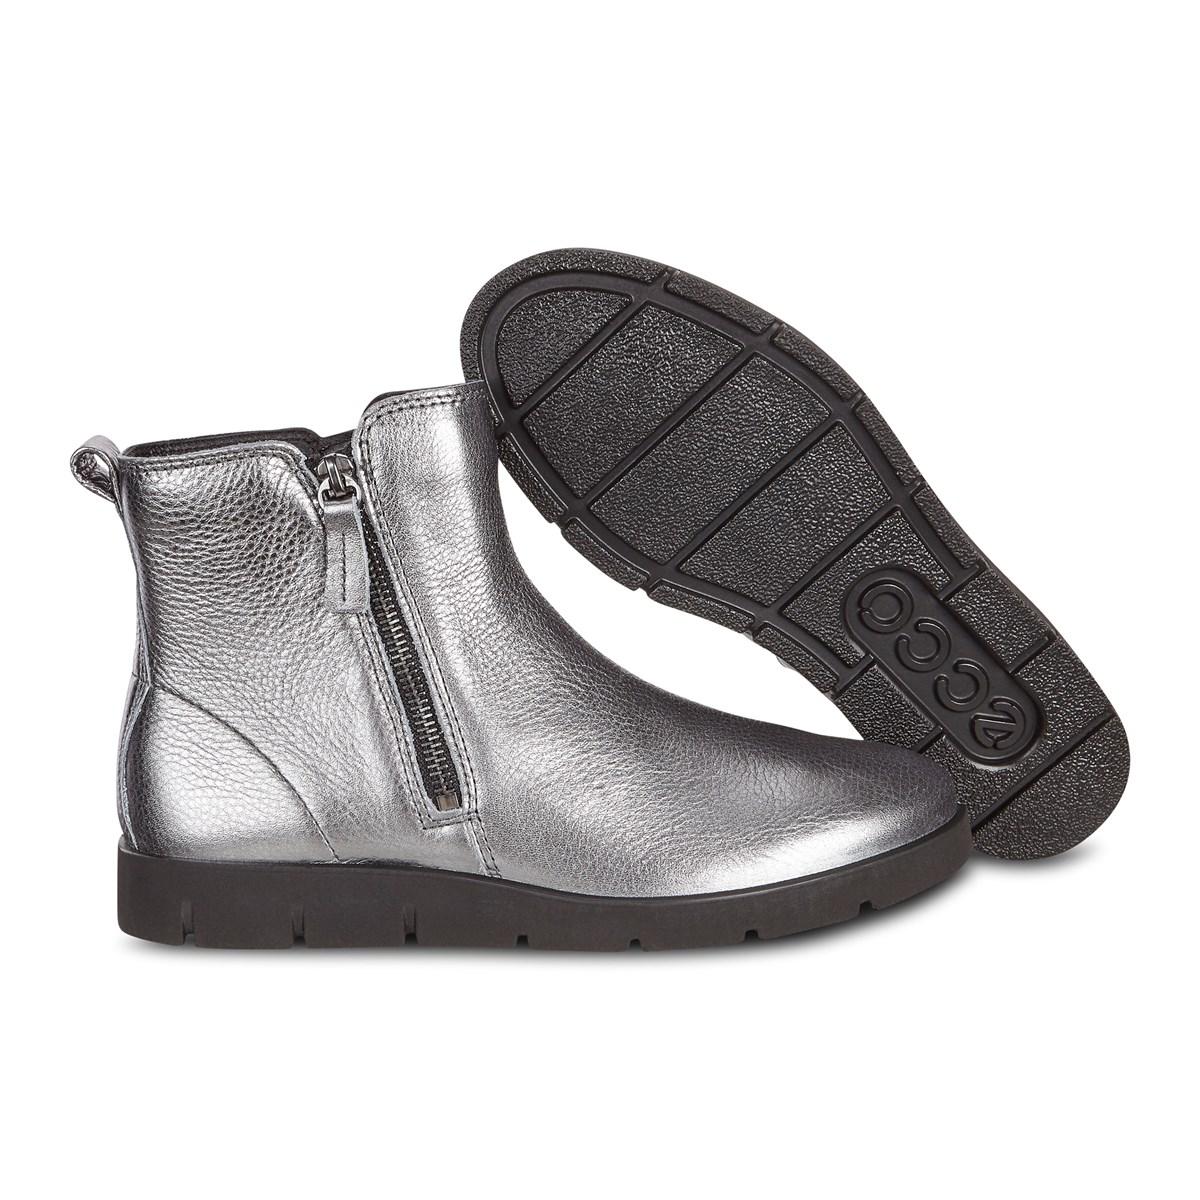 e17698bd0e23da Boots - BELLA - ECCO Shoes NZ